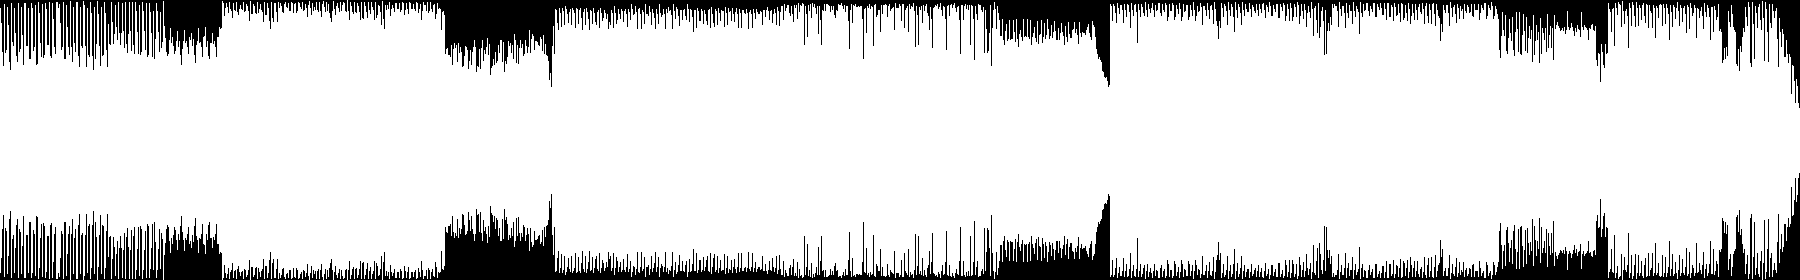 Boiler Tech audio waveform